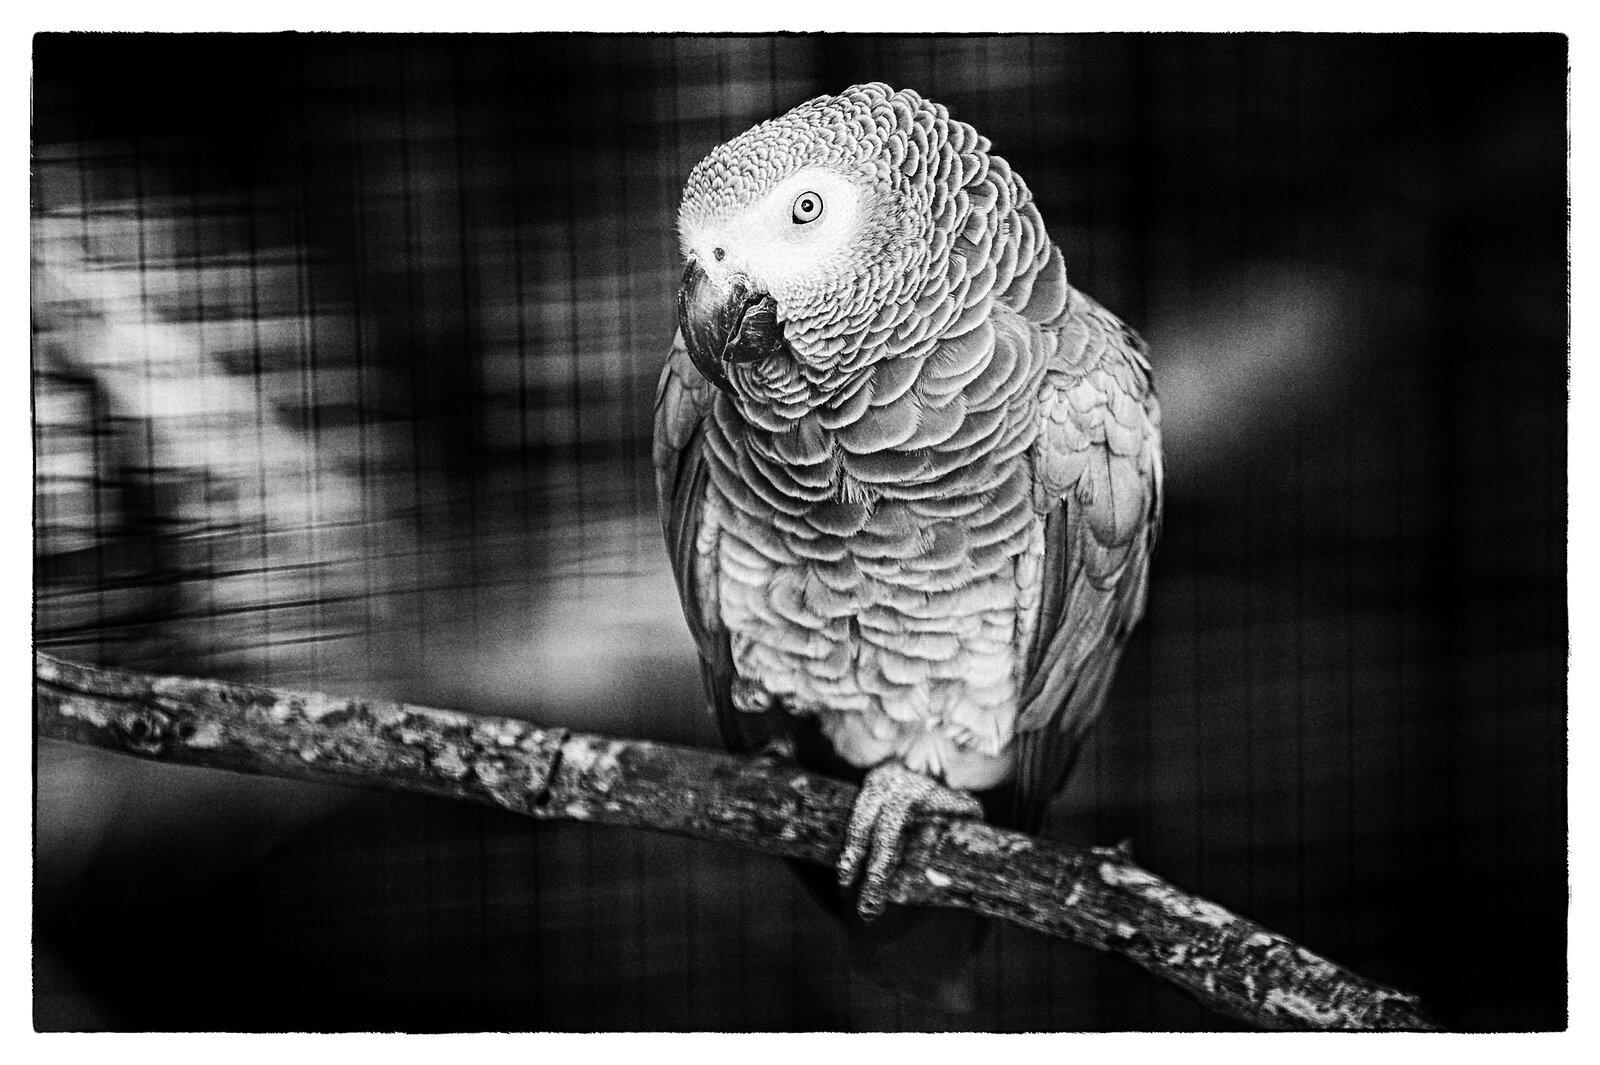 08-16-2020_zoo_NZ6_7118-Edit.jpg